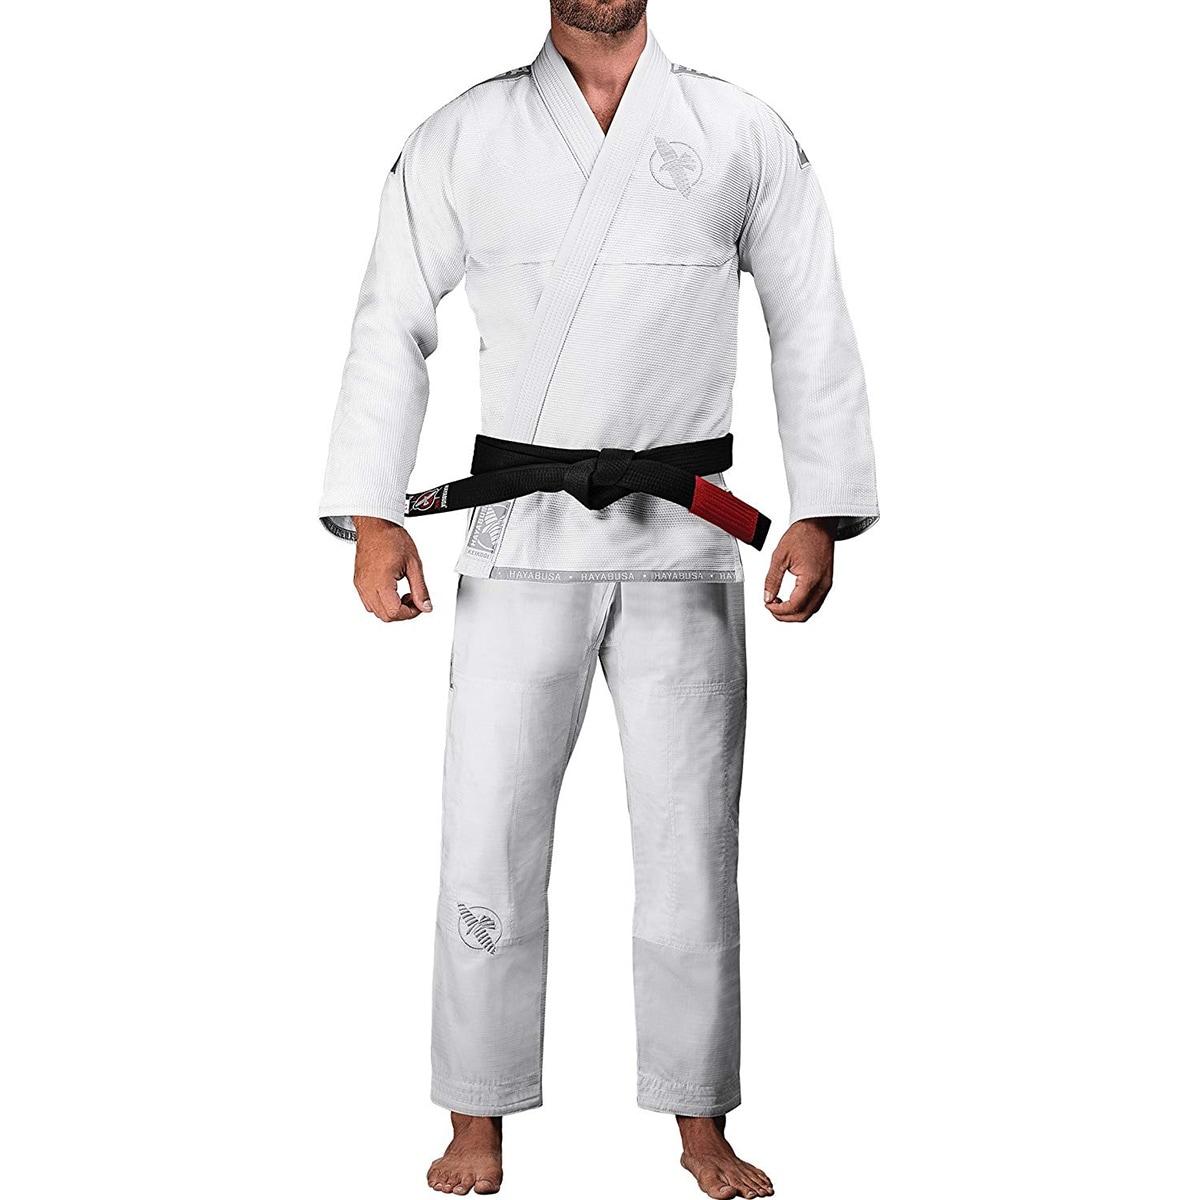 White Hayabusa Lightweight Pearl Weave Jiu-Jitsu Gi